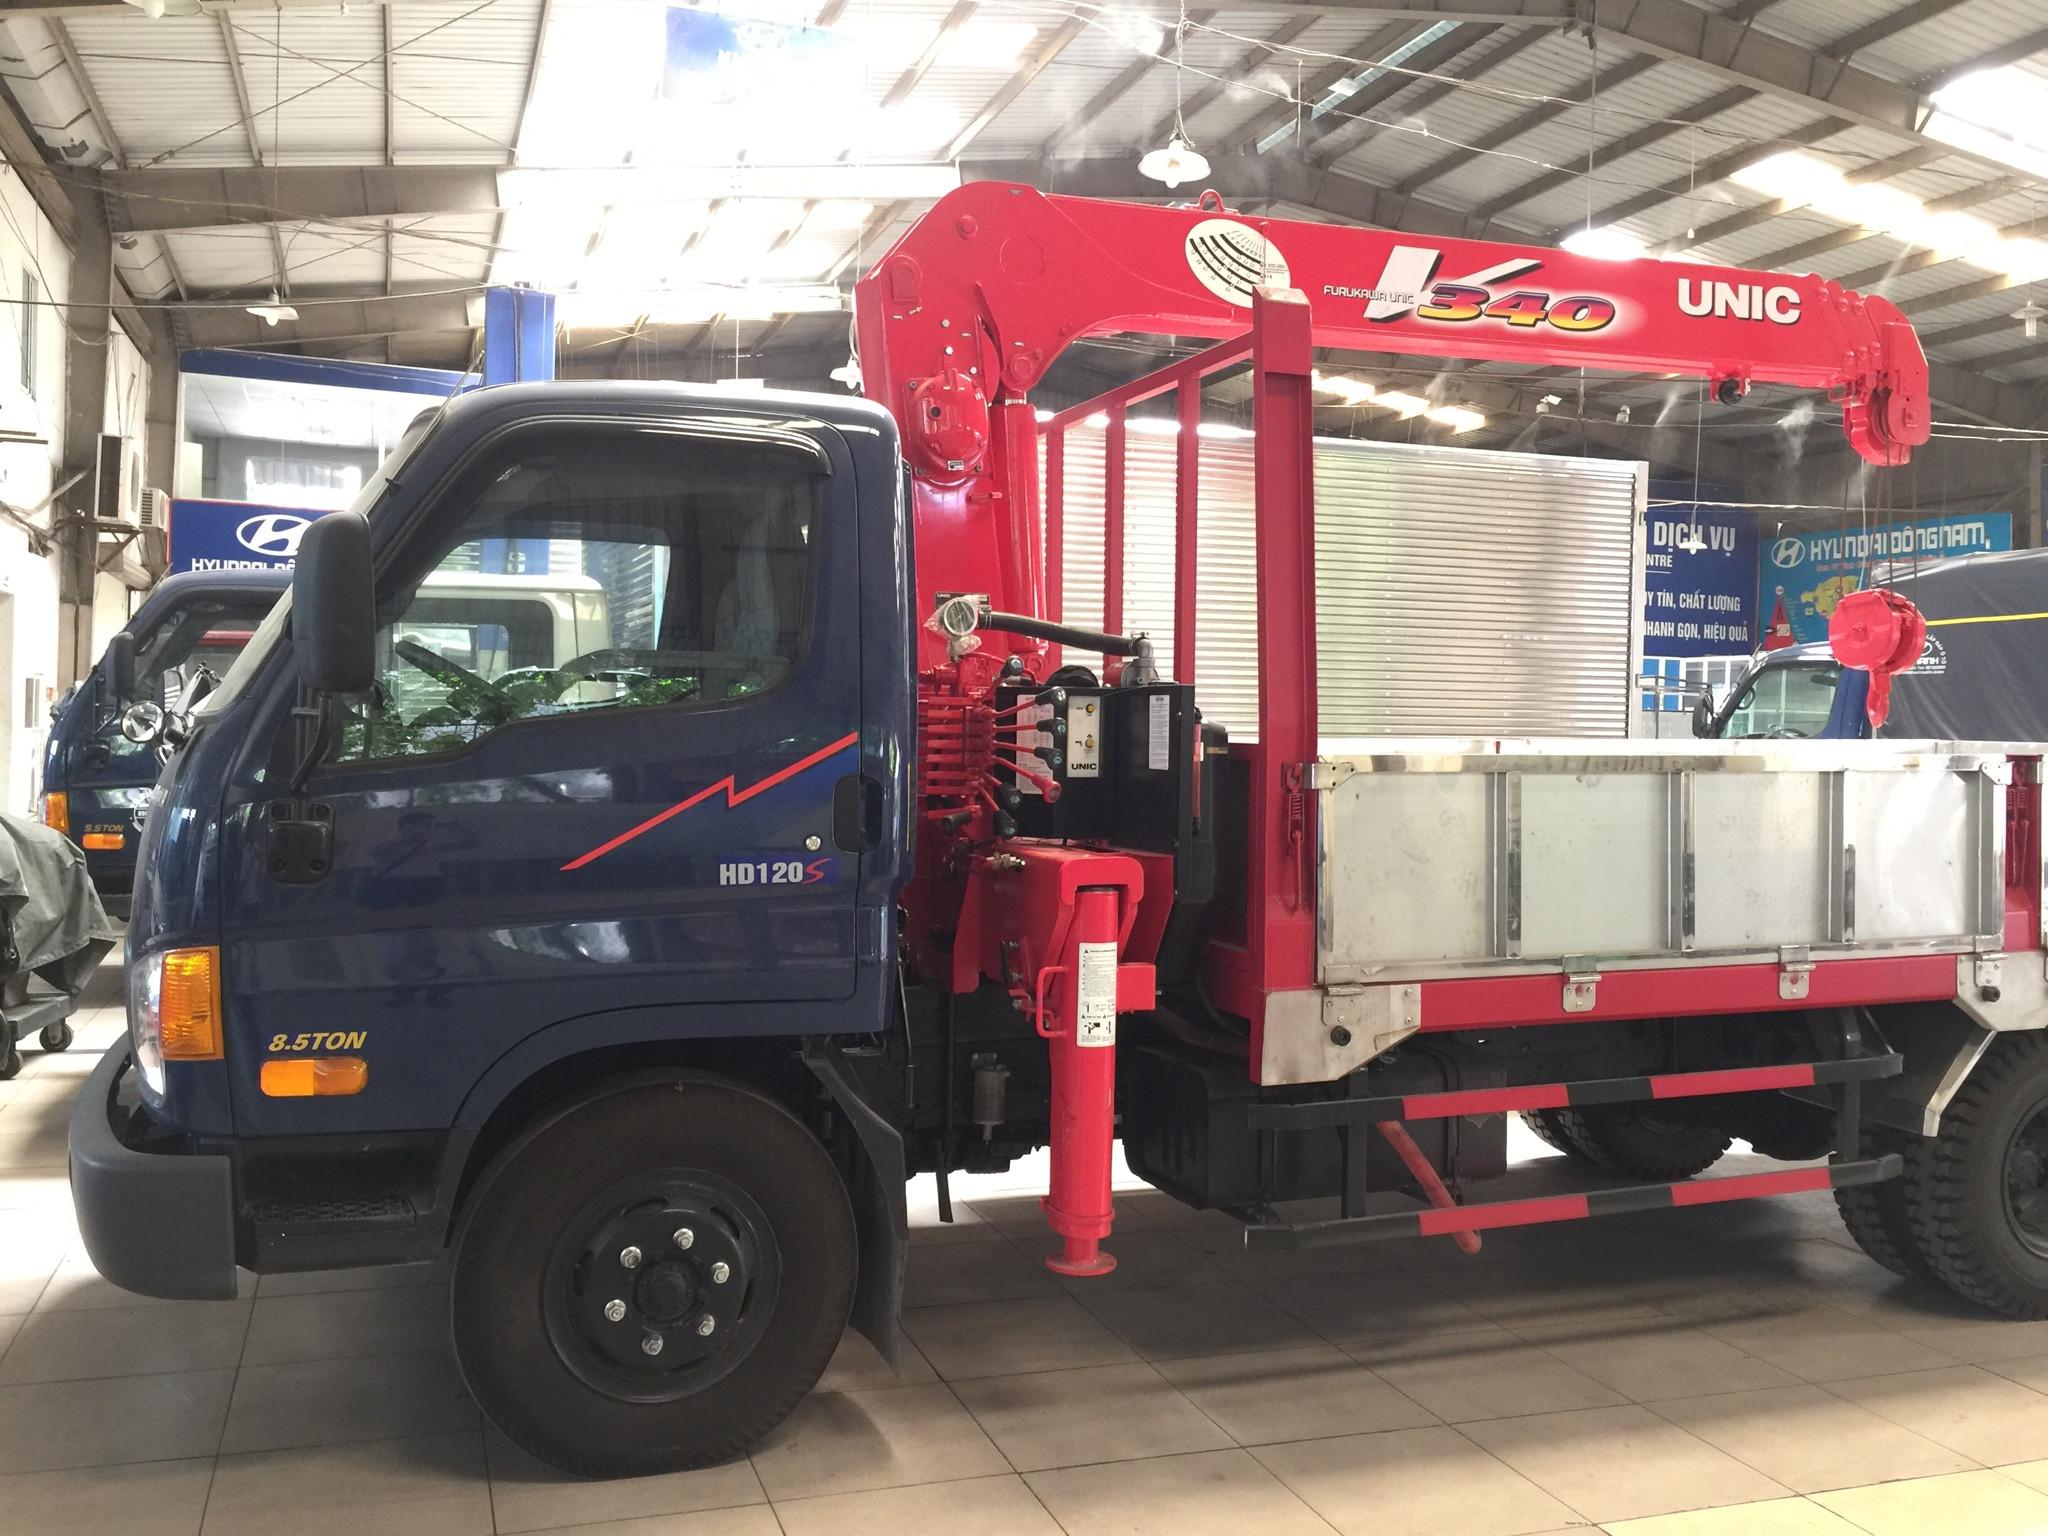 xe tải gắn cẩu hyundai hd120s 8.5 tấn